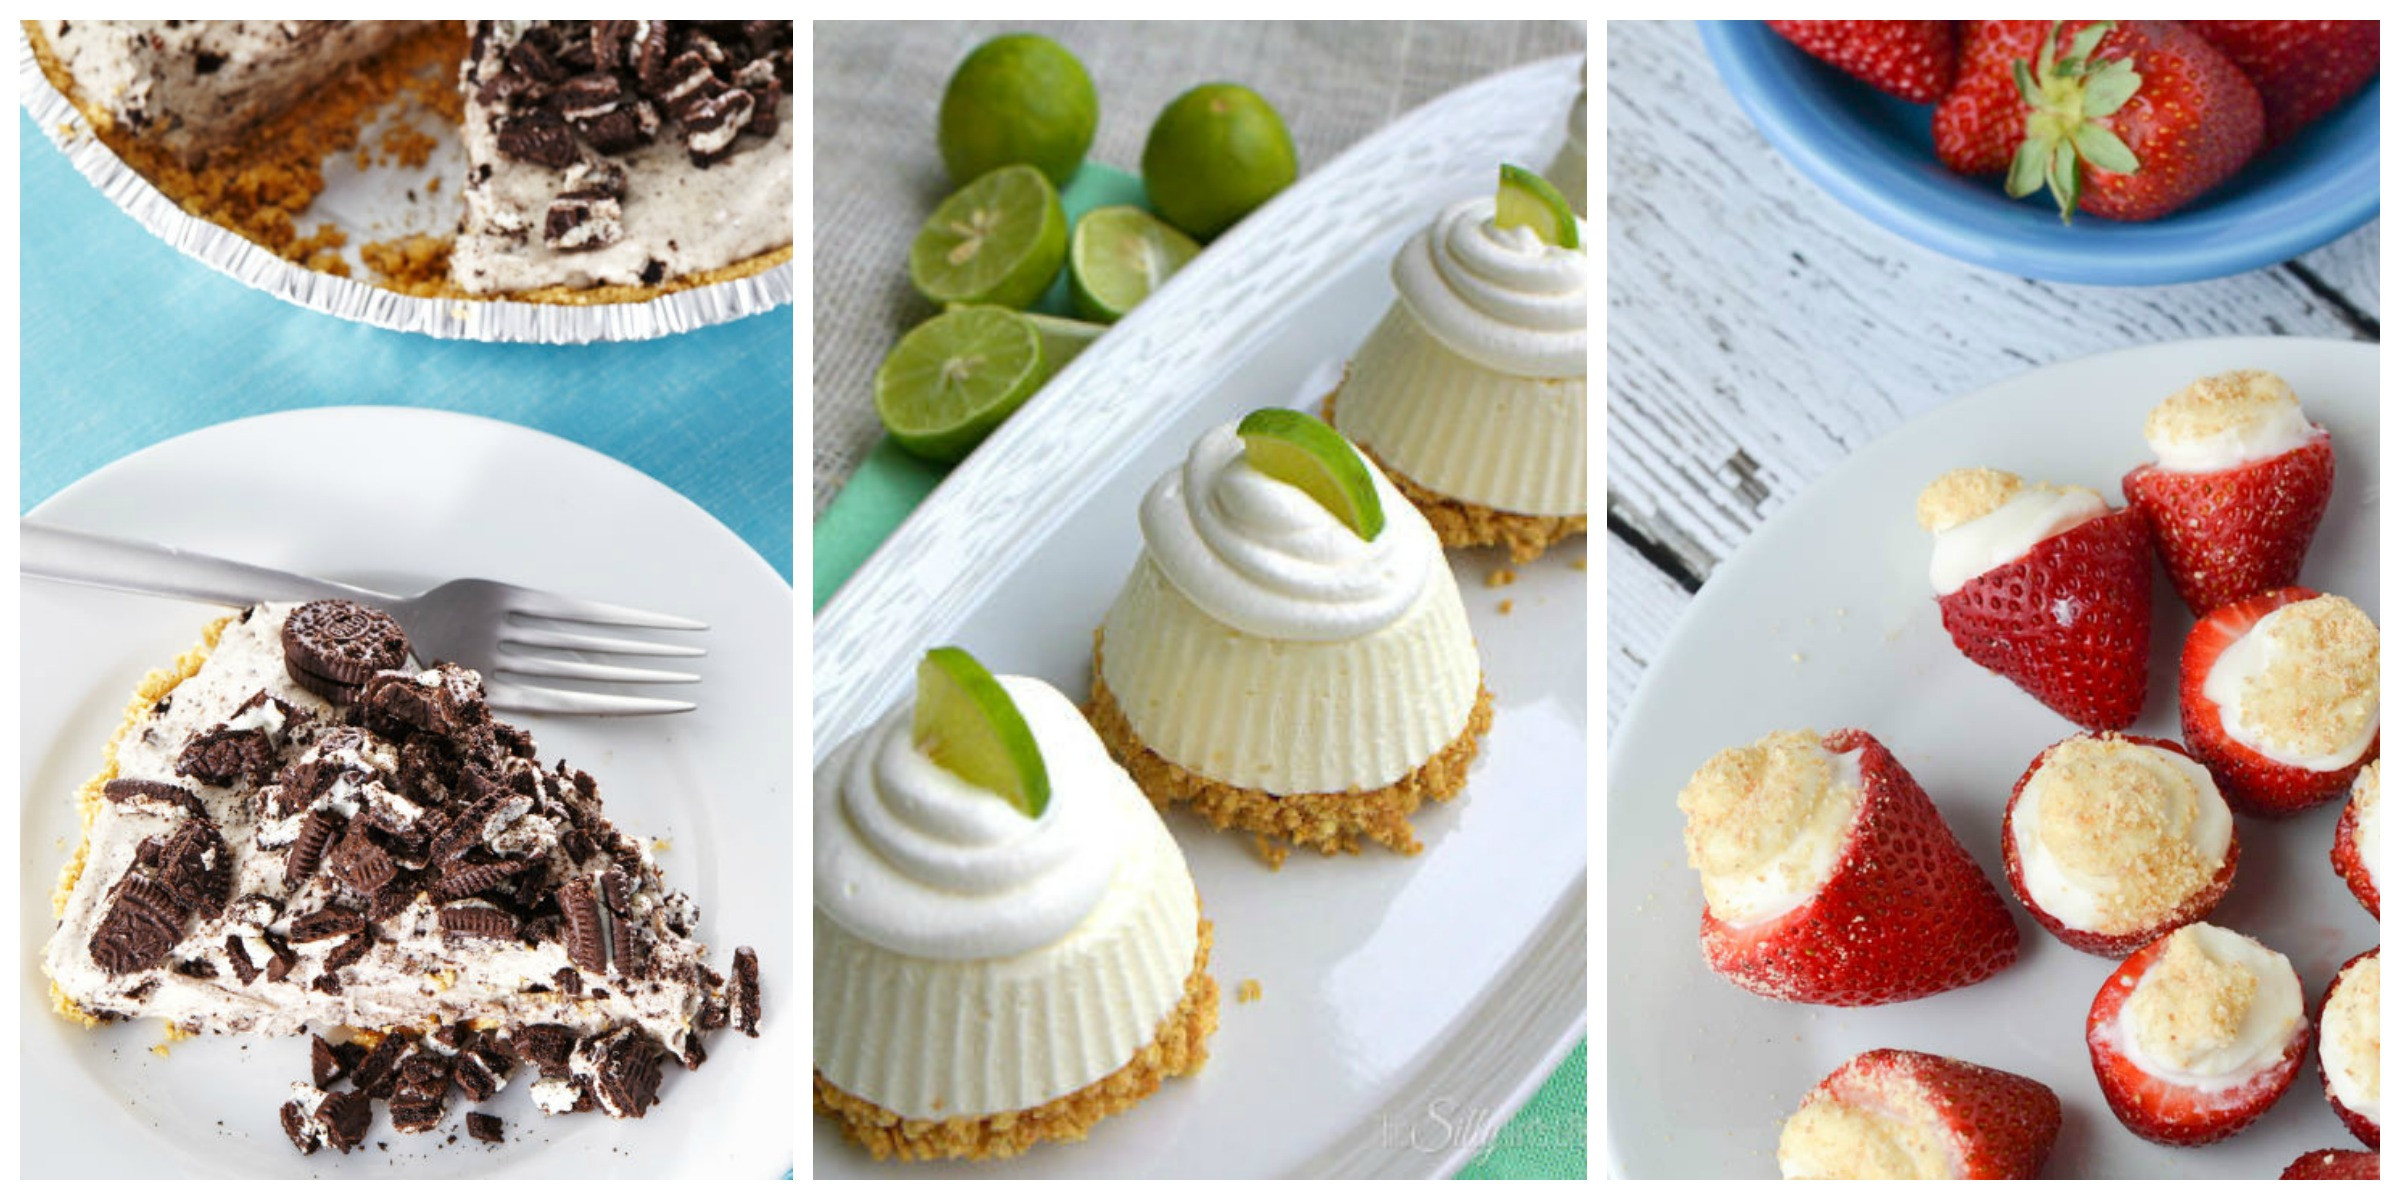 Summer Easy Desserts  57 Easy Summer Desserts Best Recipes for Frozen Summer